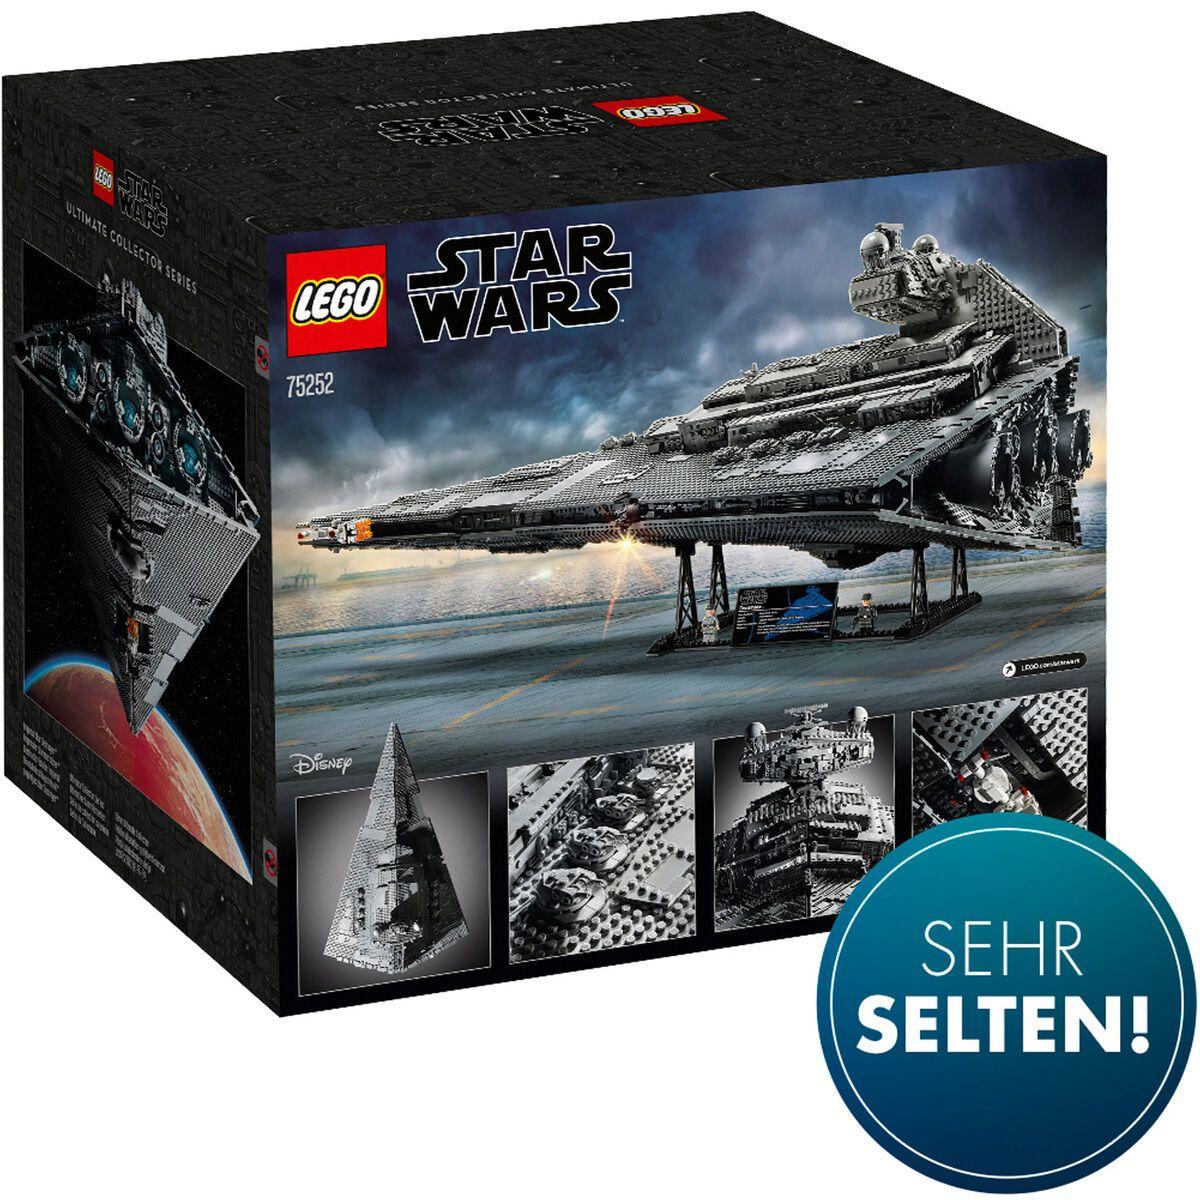 LEGO® Star Wars™ 75252 Imperialer Sternzerstörer™ | Galeria.de